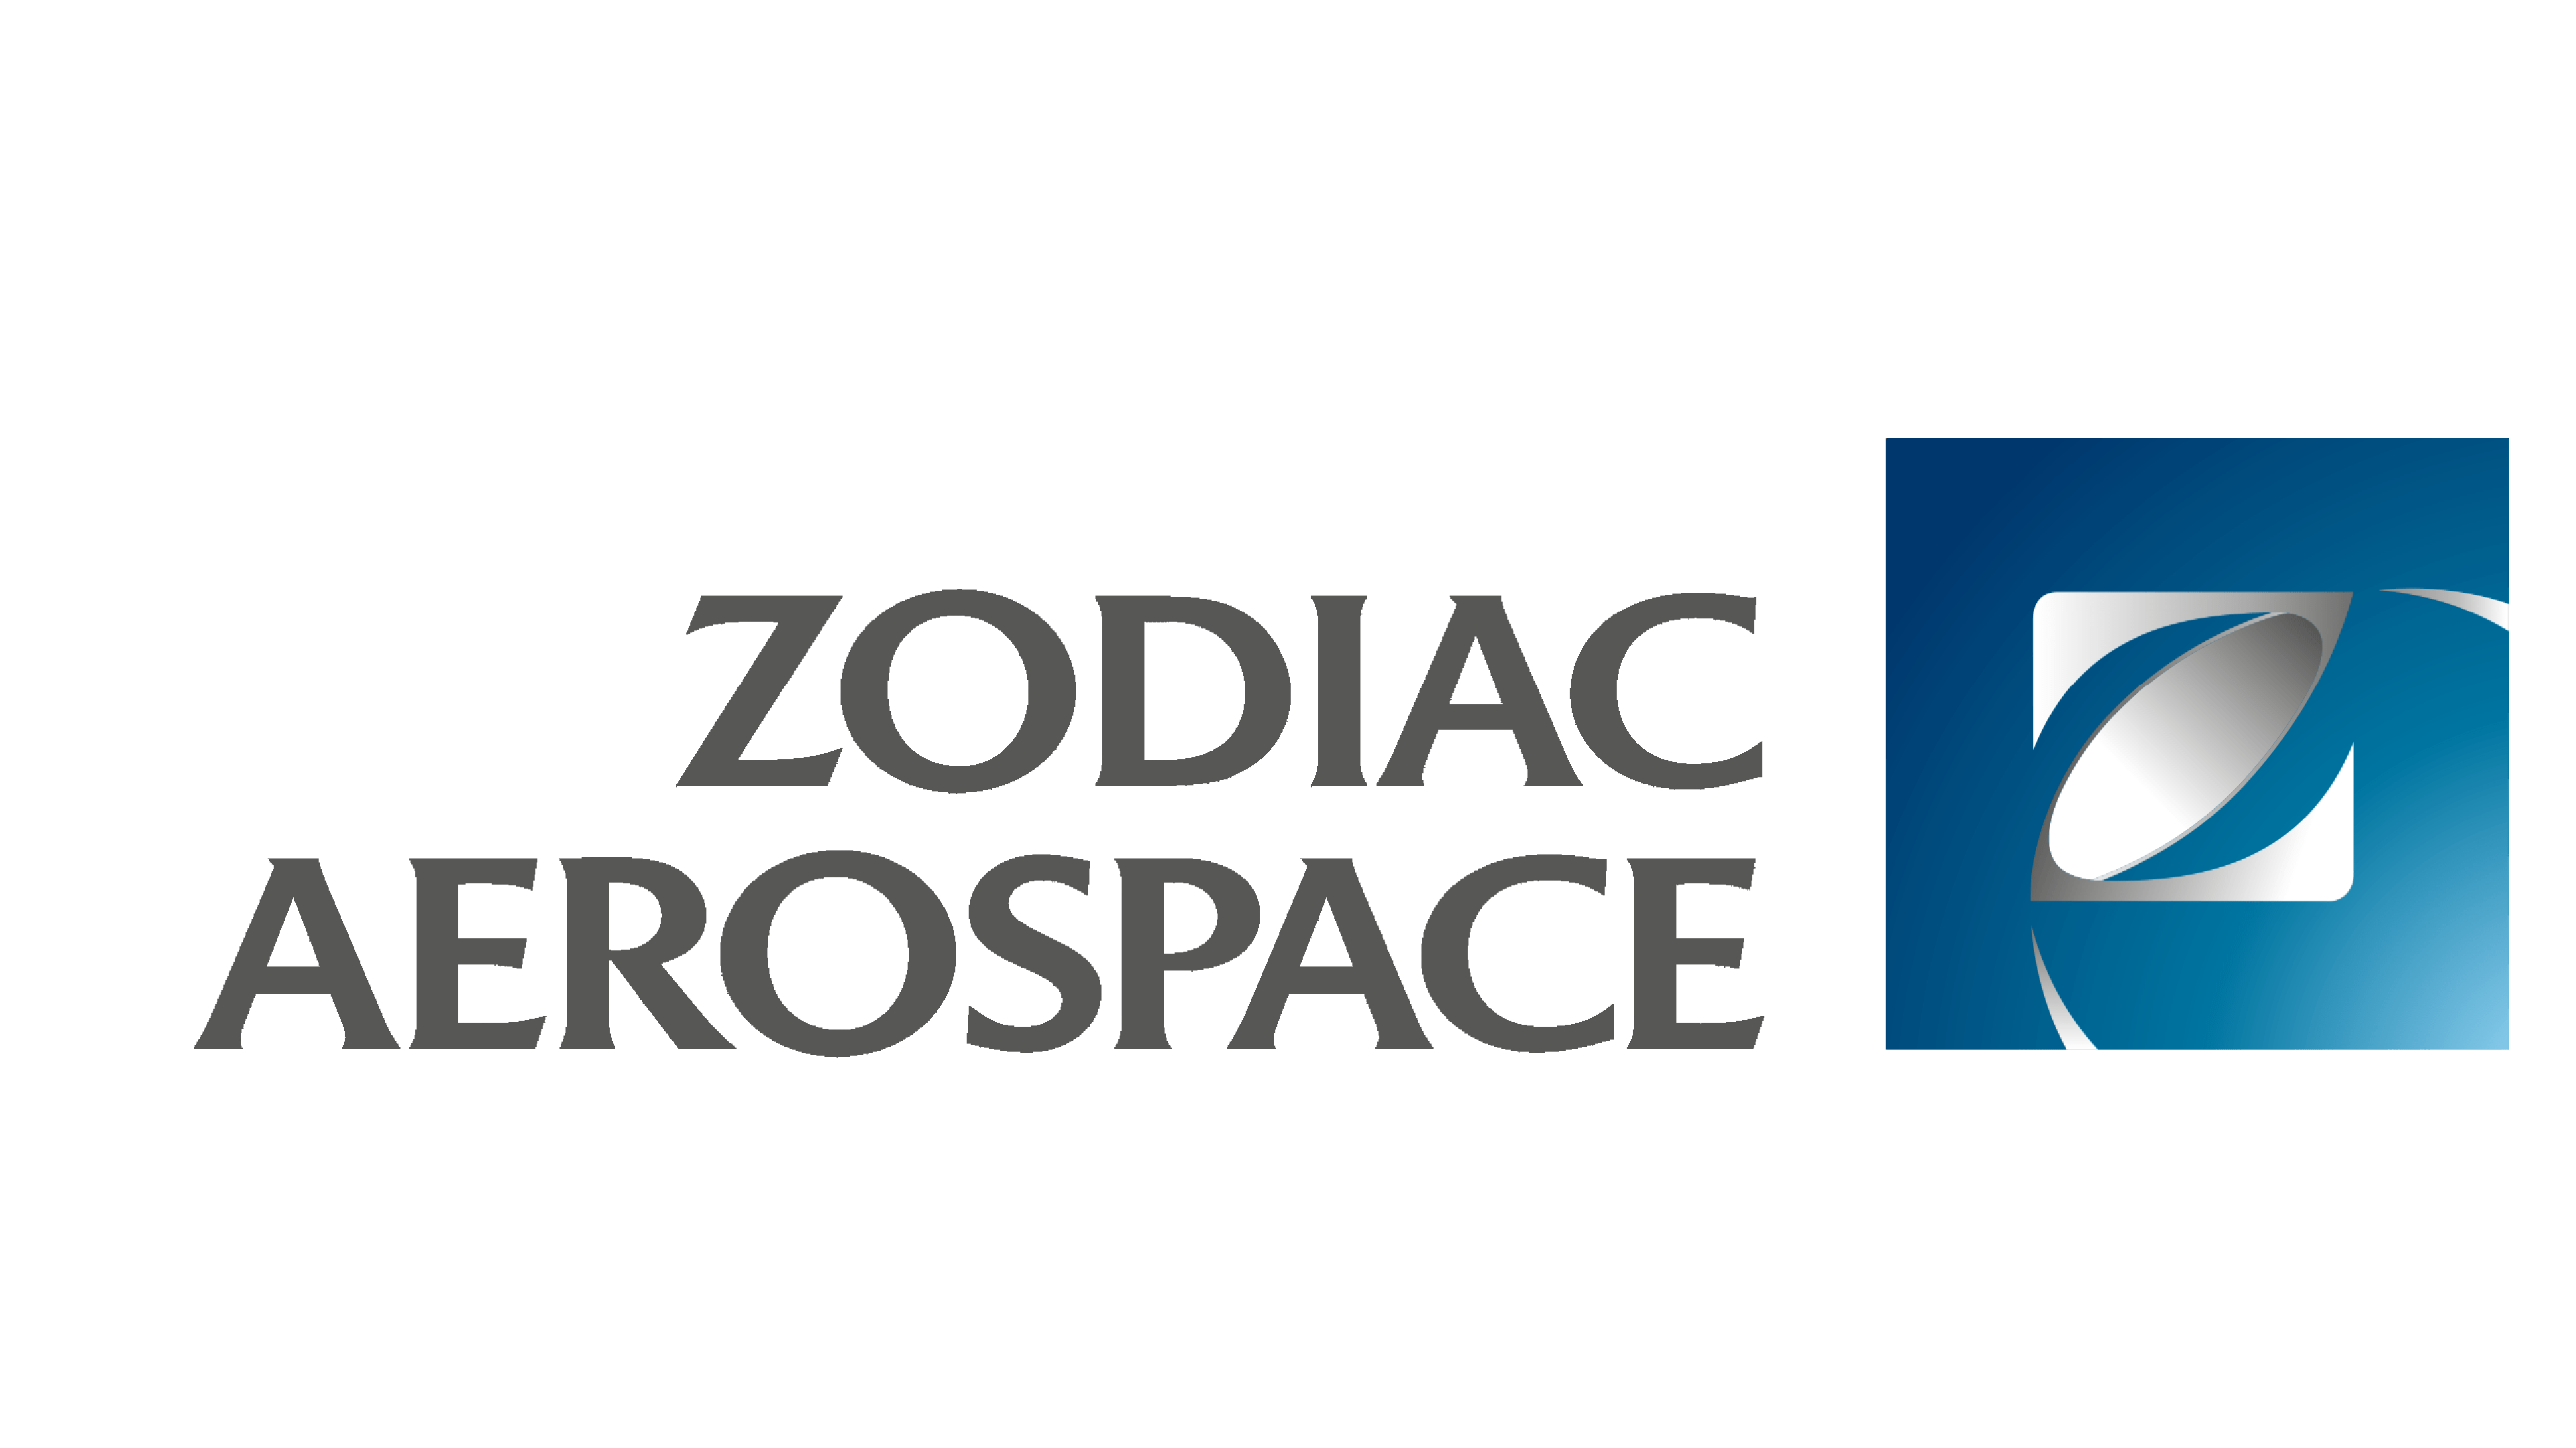 Zodiac Aerospace Logo Logo